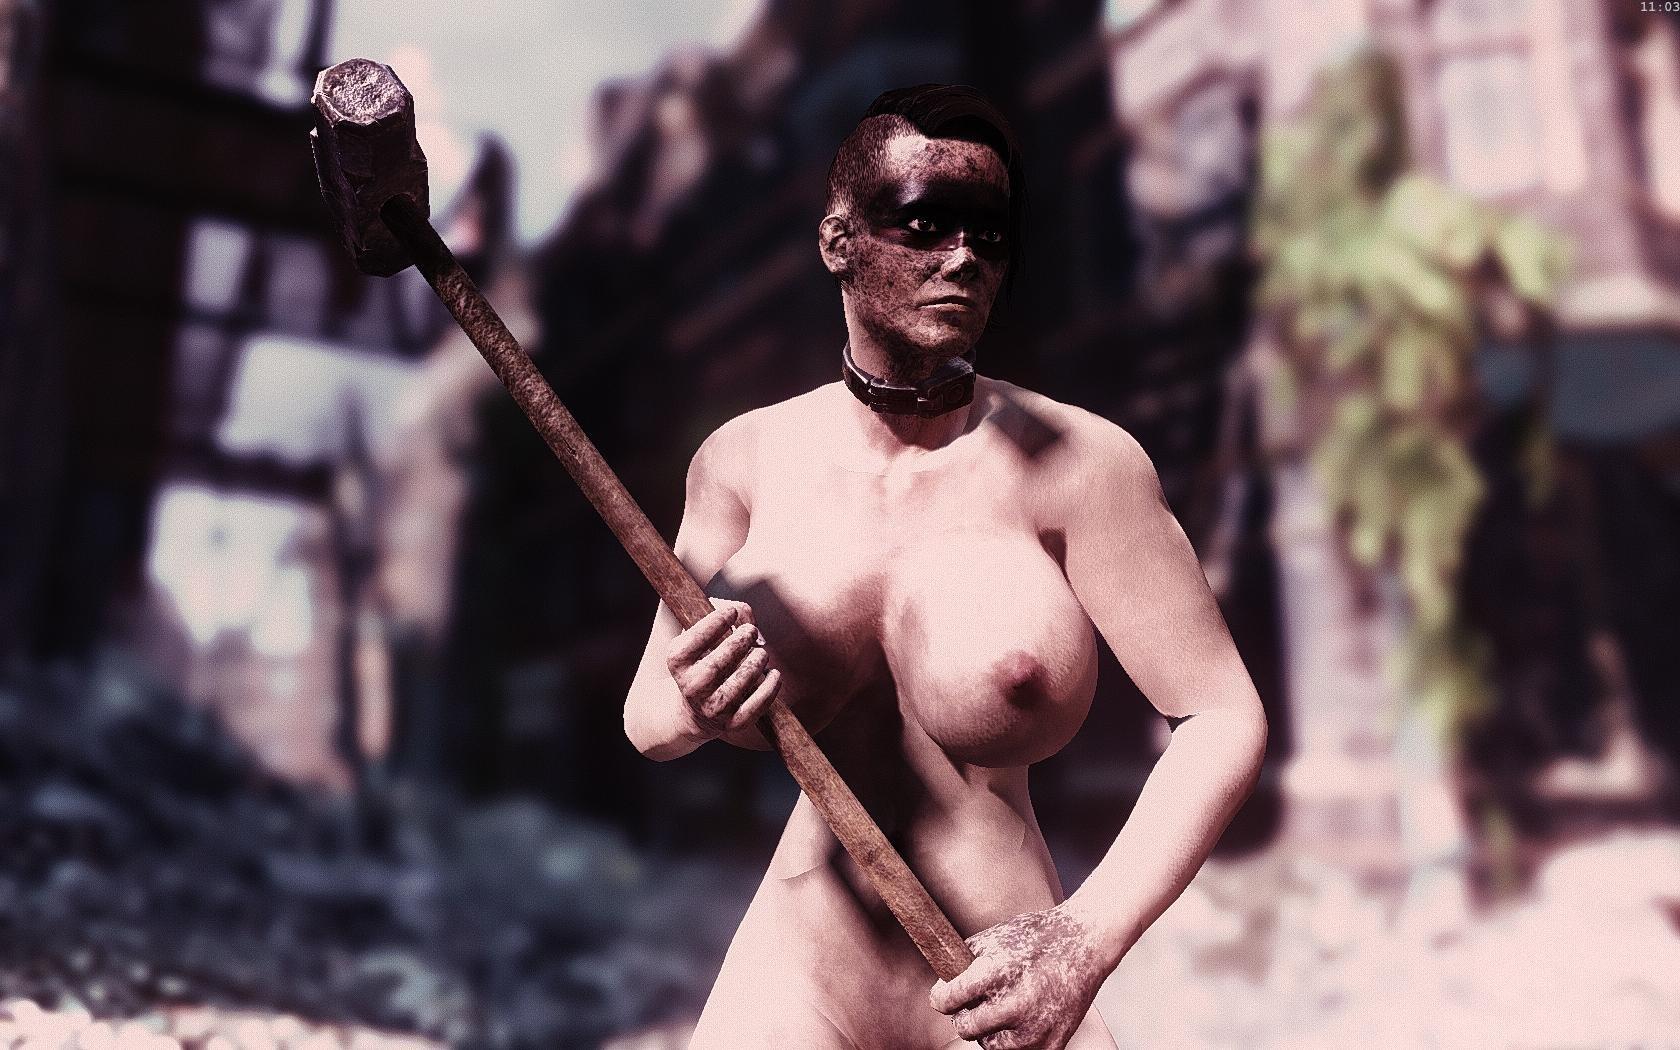 Fallout4 2019-03-25 11-03-08-64